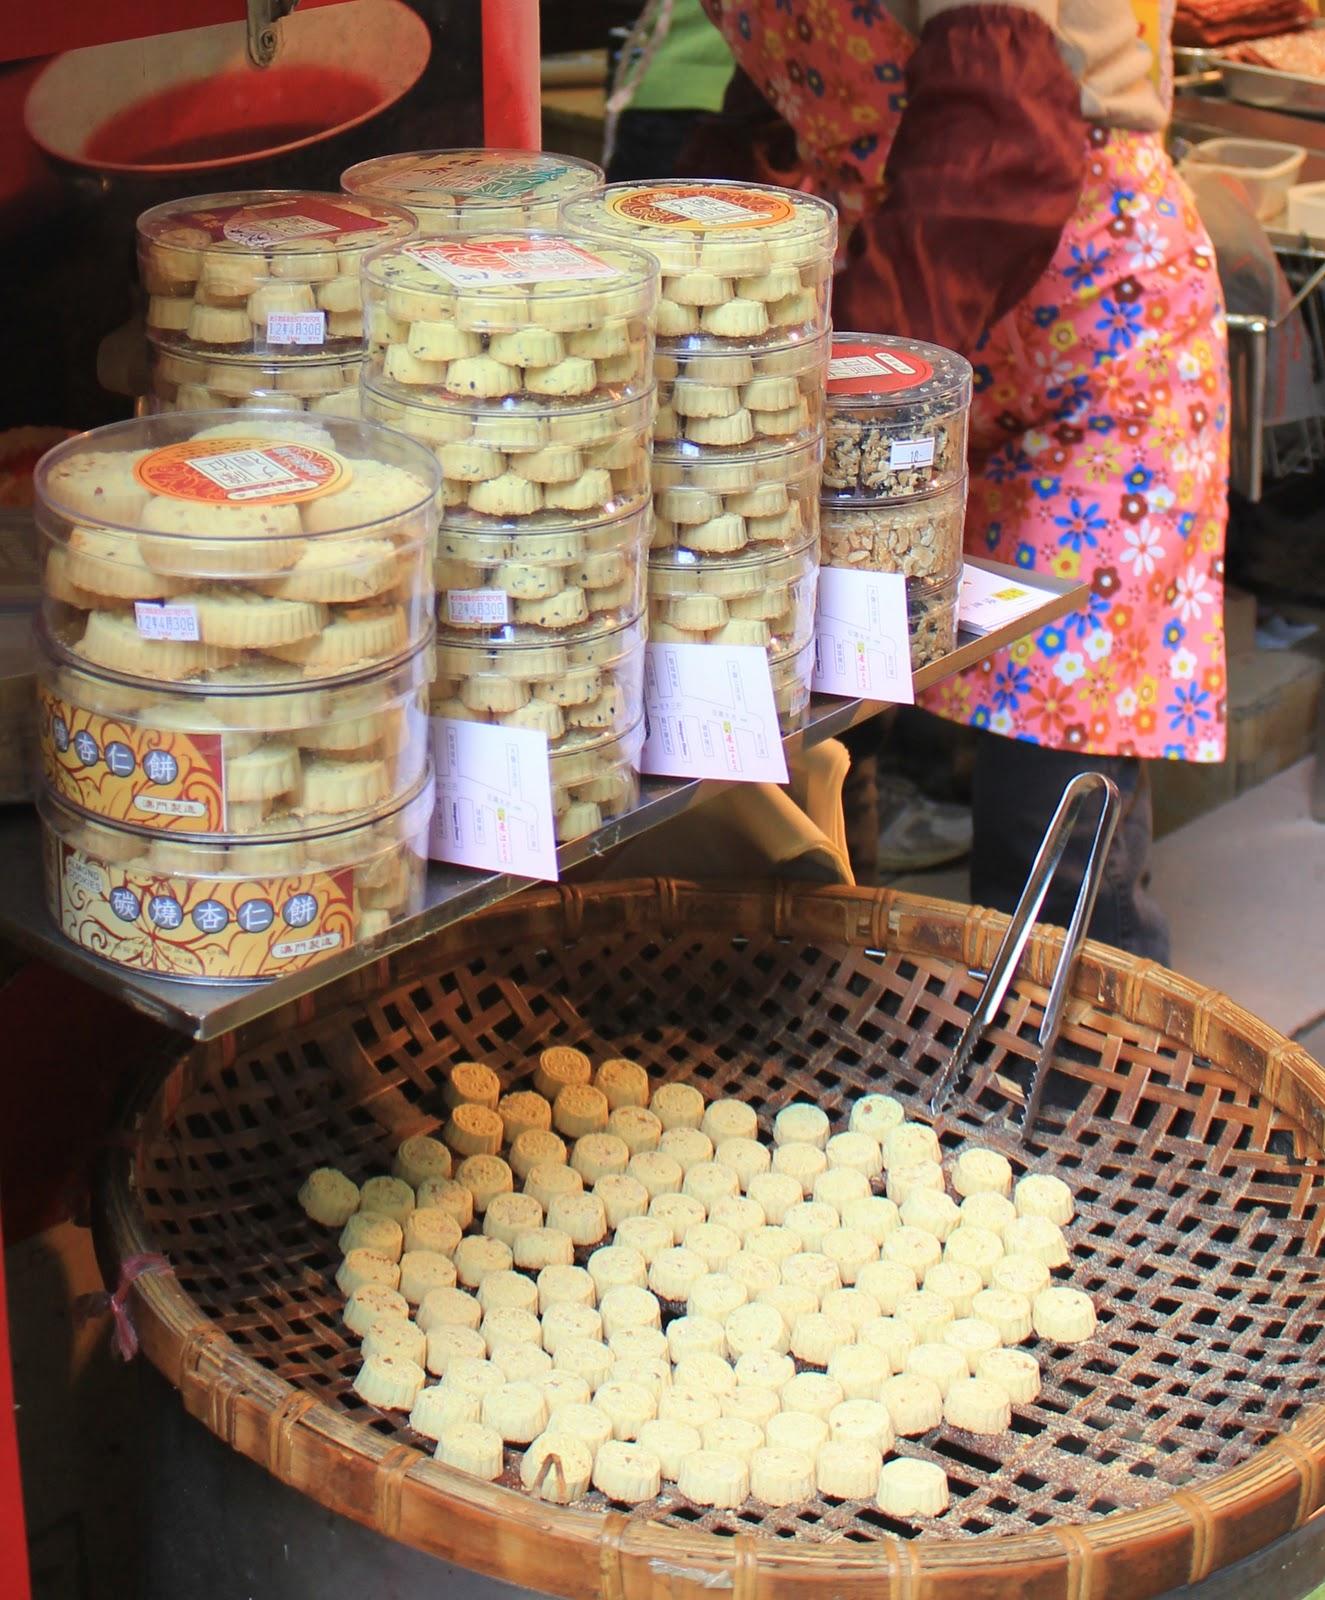 Almond Cookies Macau The Famous Macau Almond